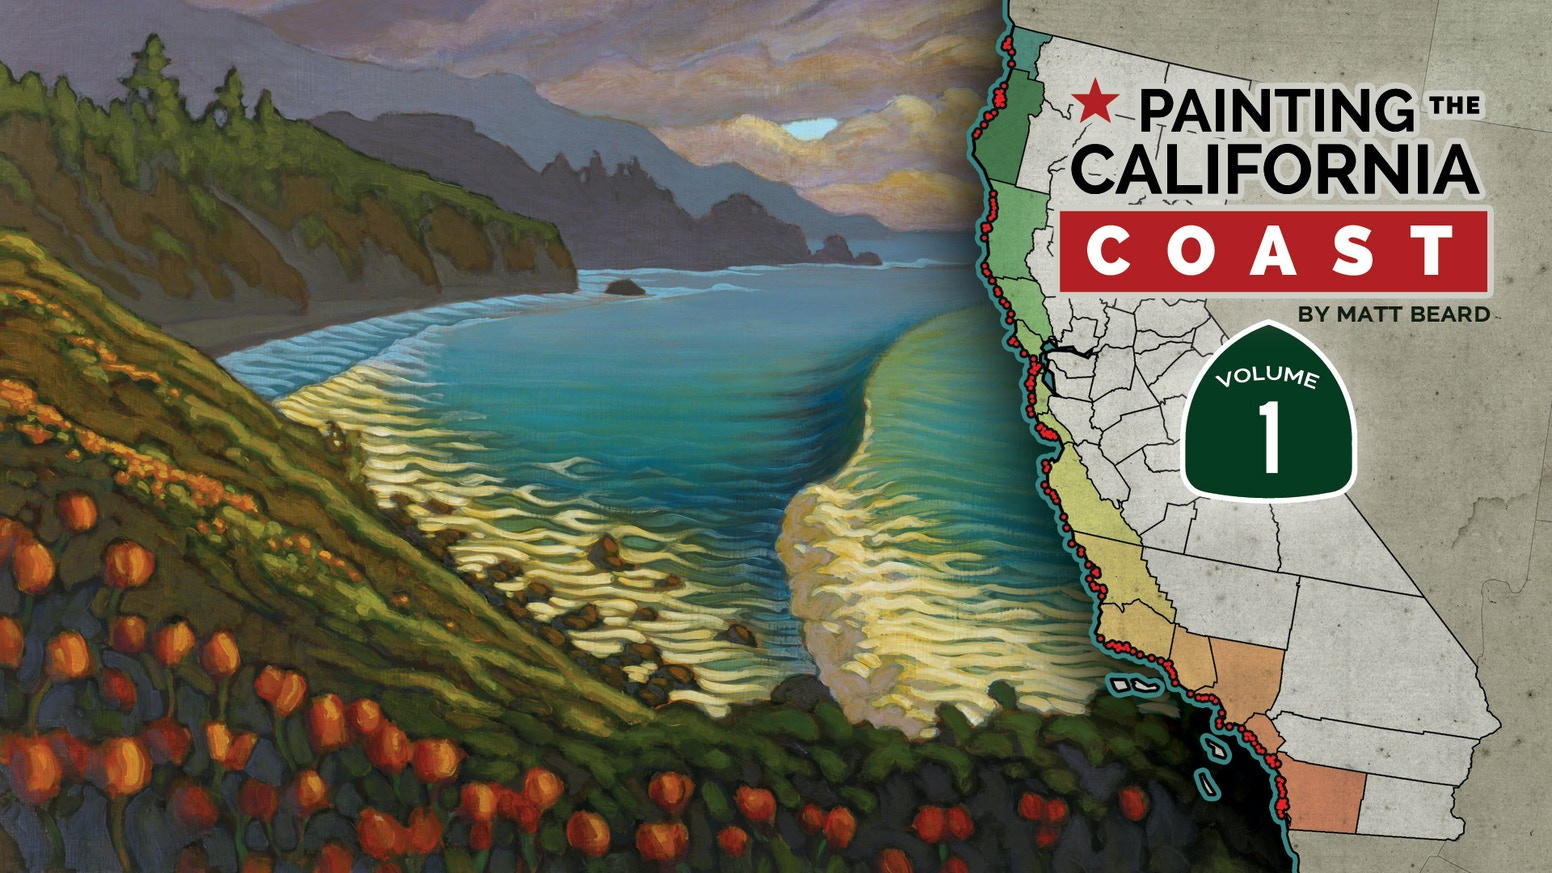 New Report Paints Californias Charter >> Painting The California Coast Volume One By Matt Beard Kickstarter